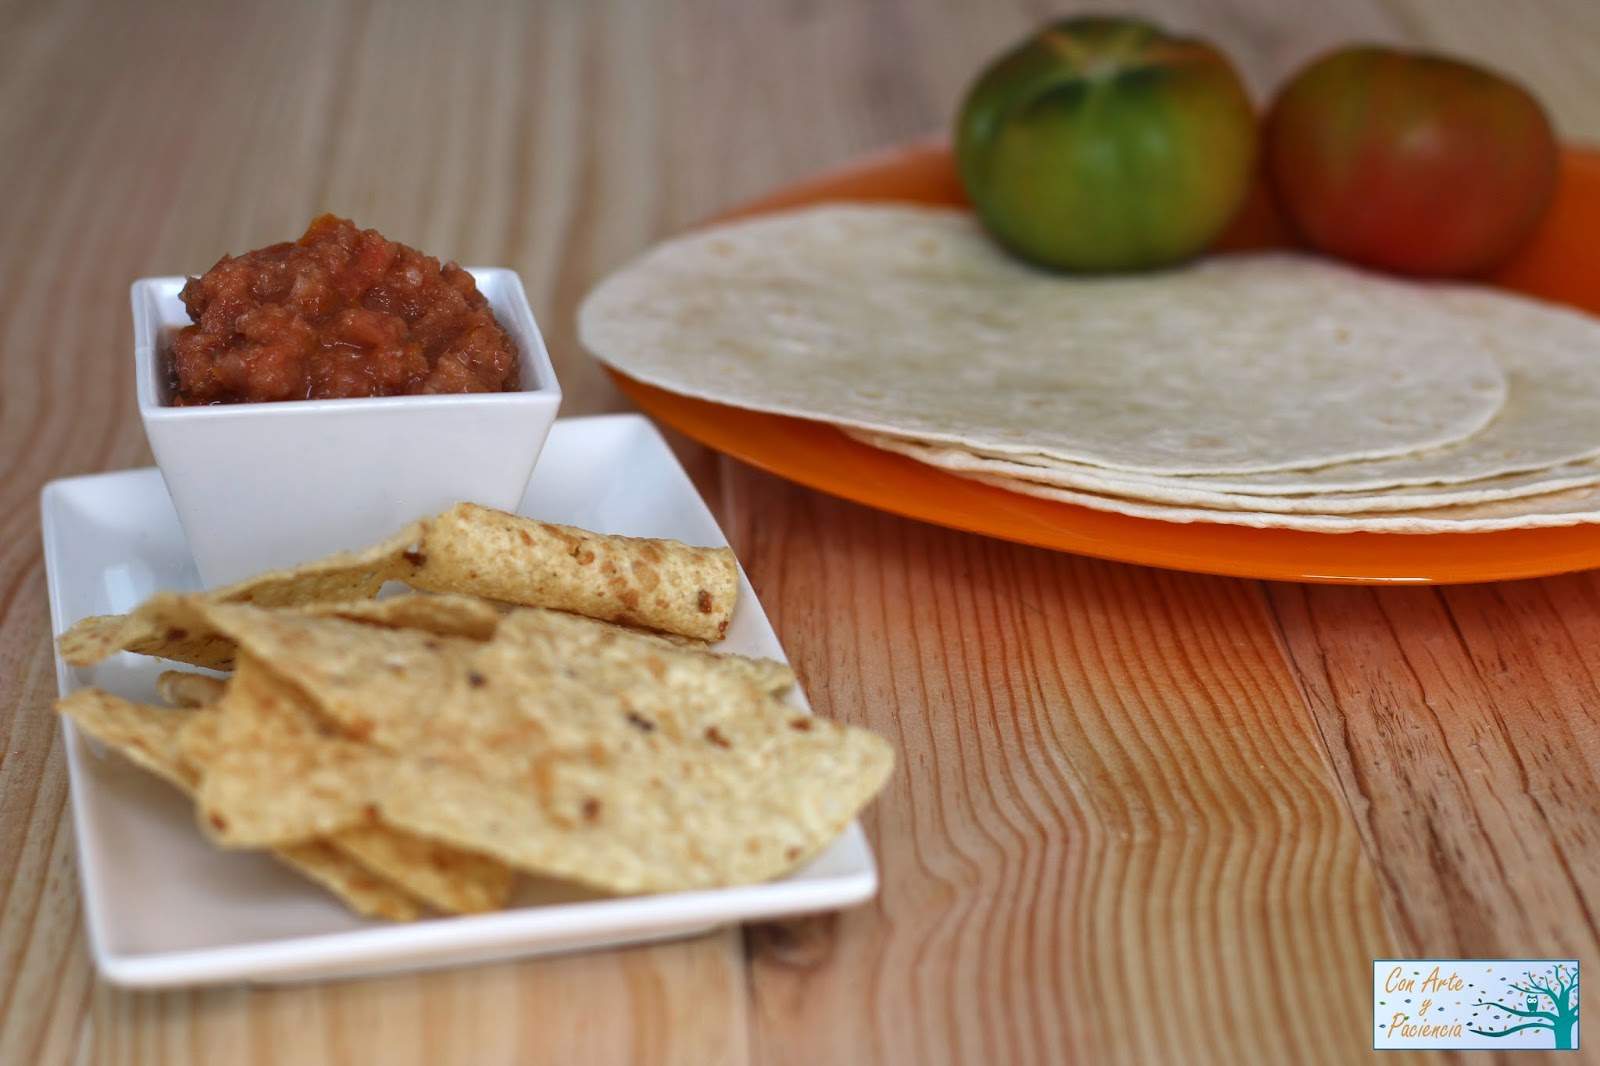 cilantro,pimienta,jamaica,salsa,tomate,mexicana,salsa,picante,mexican,sauce